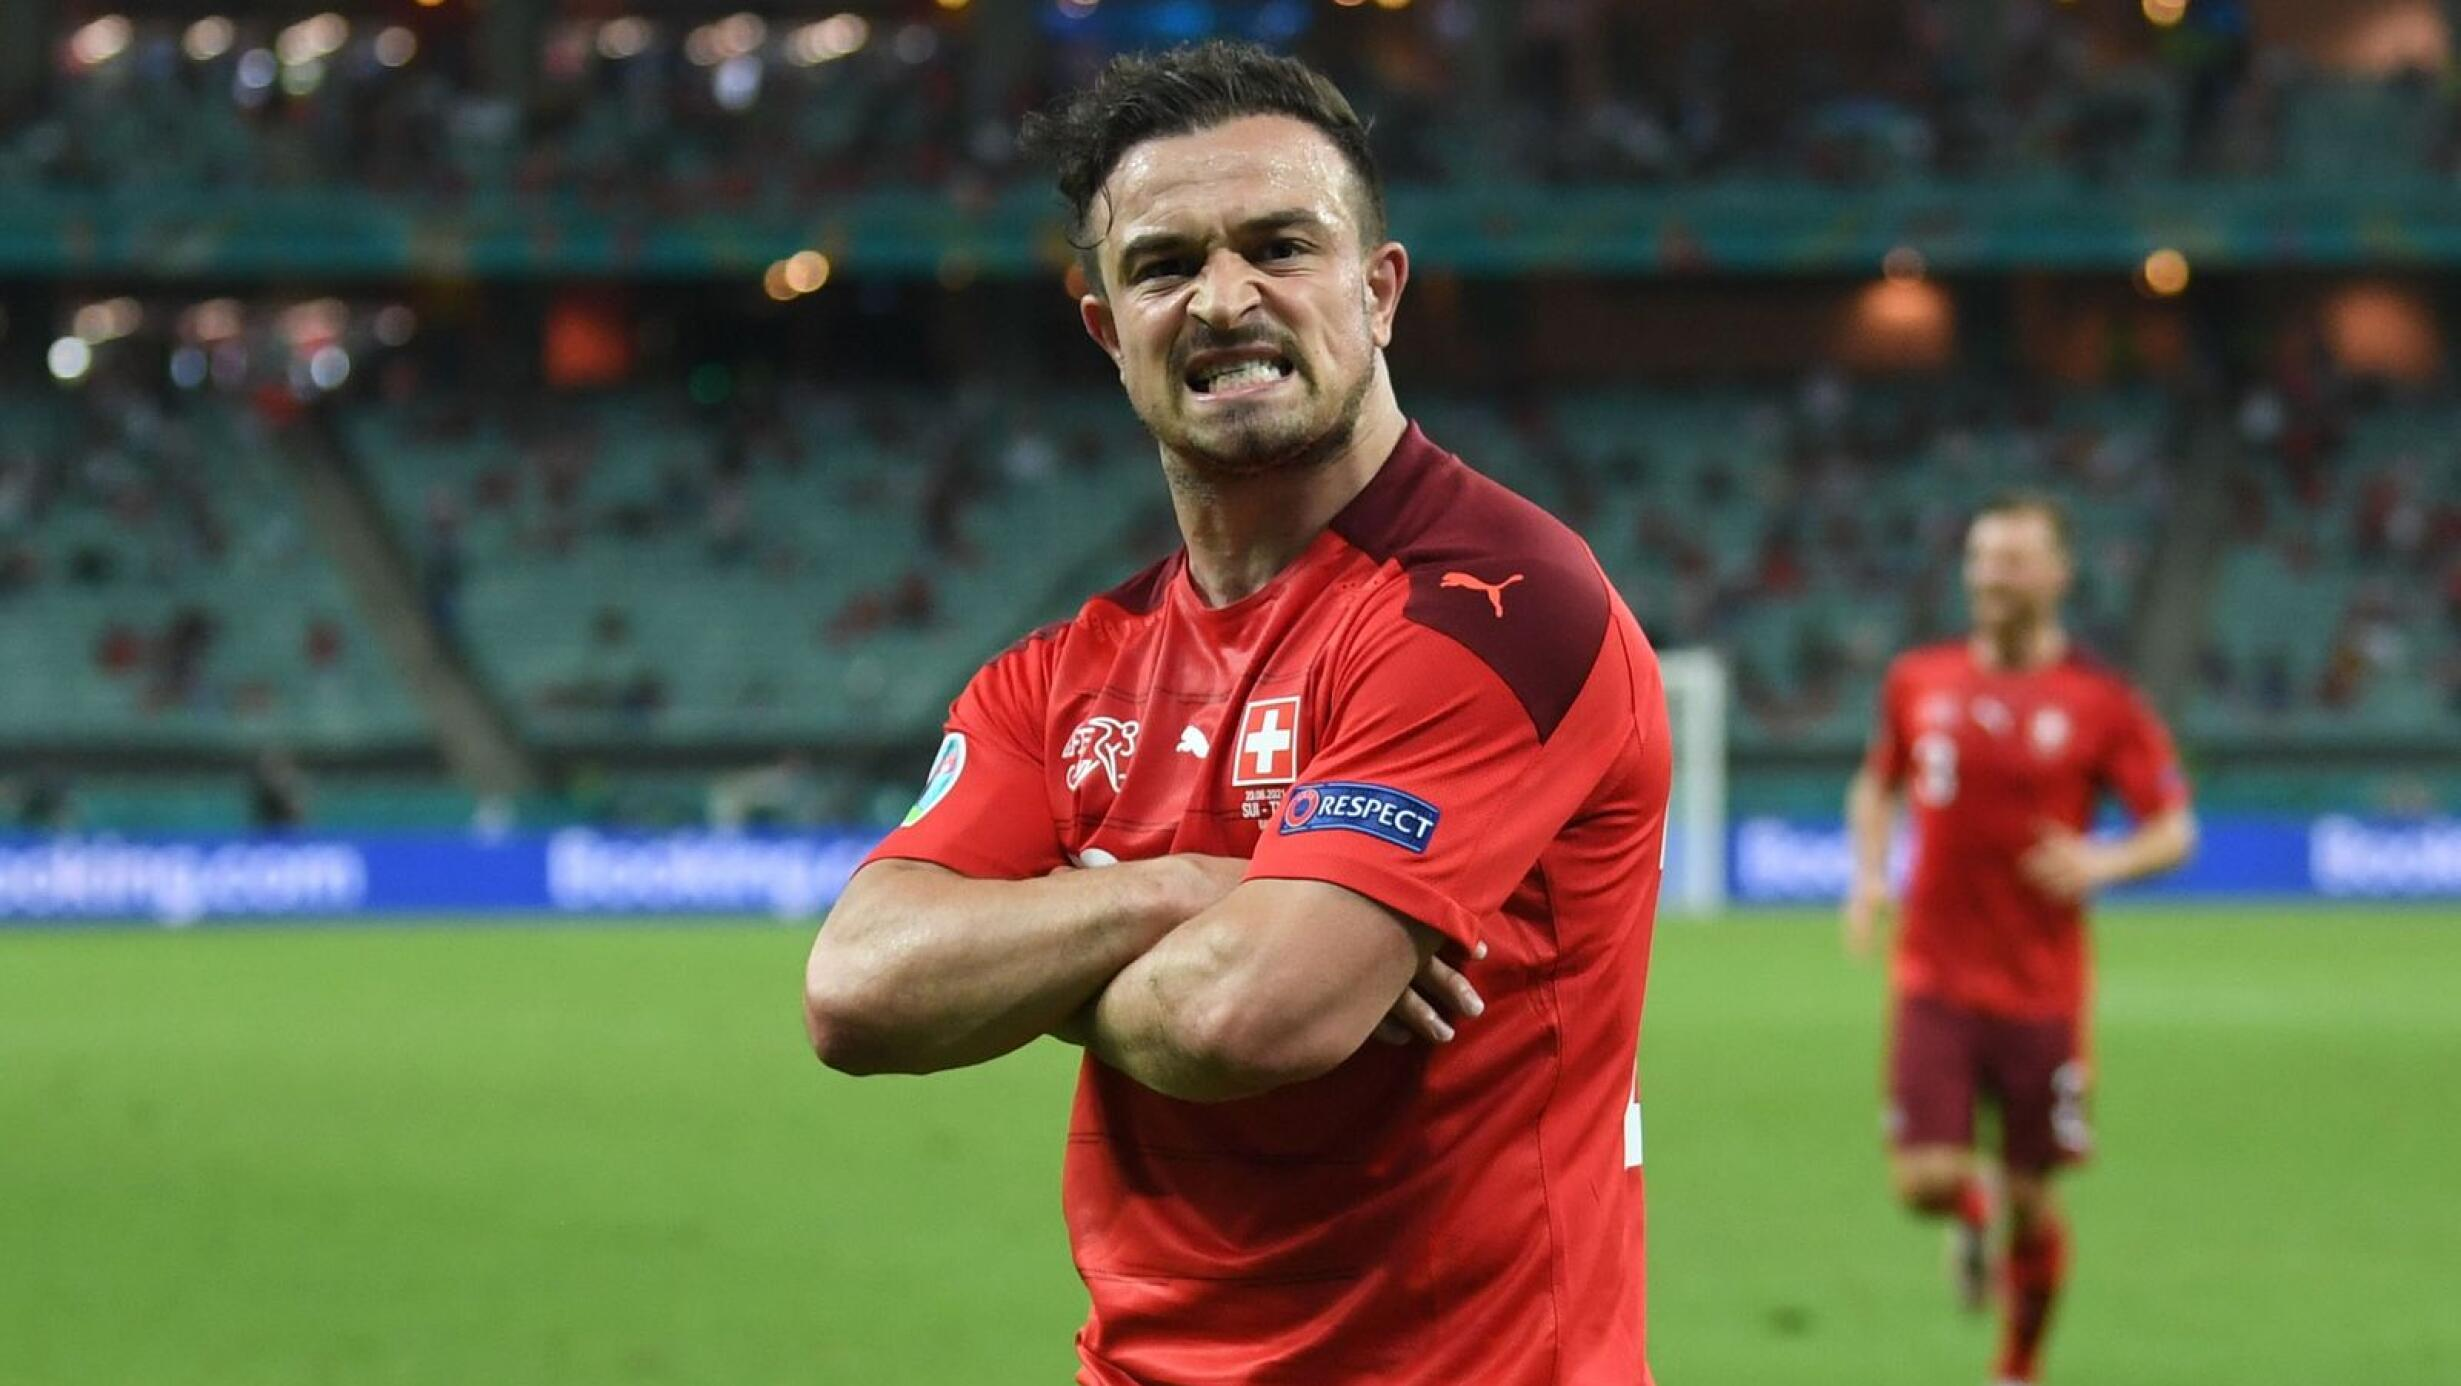 Switzerland's Xherdan Shaqiri celebrates after scoring their third goal in their Euro 2020 game against Turkey at the Baku Olympic Stadium on Sunday